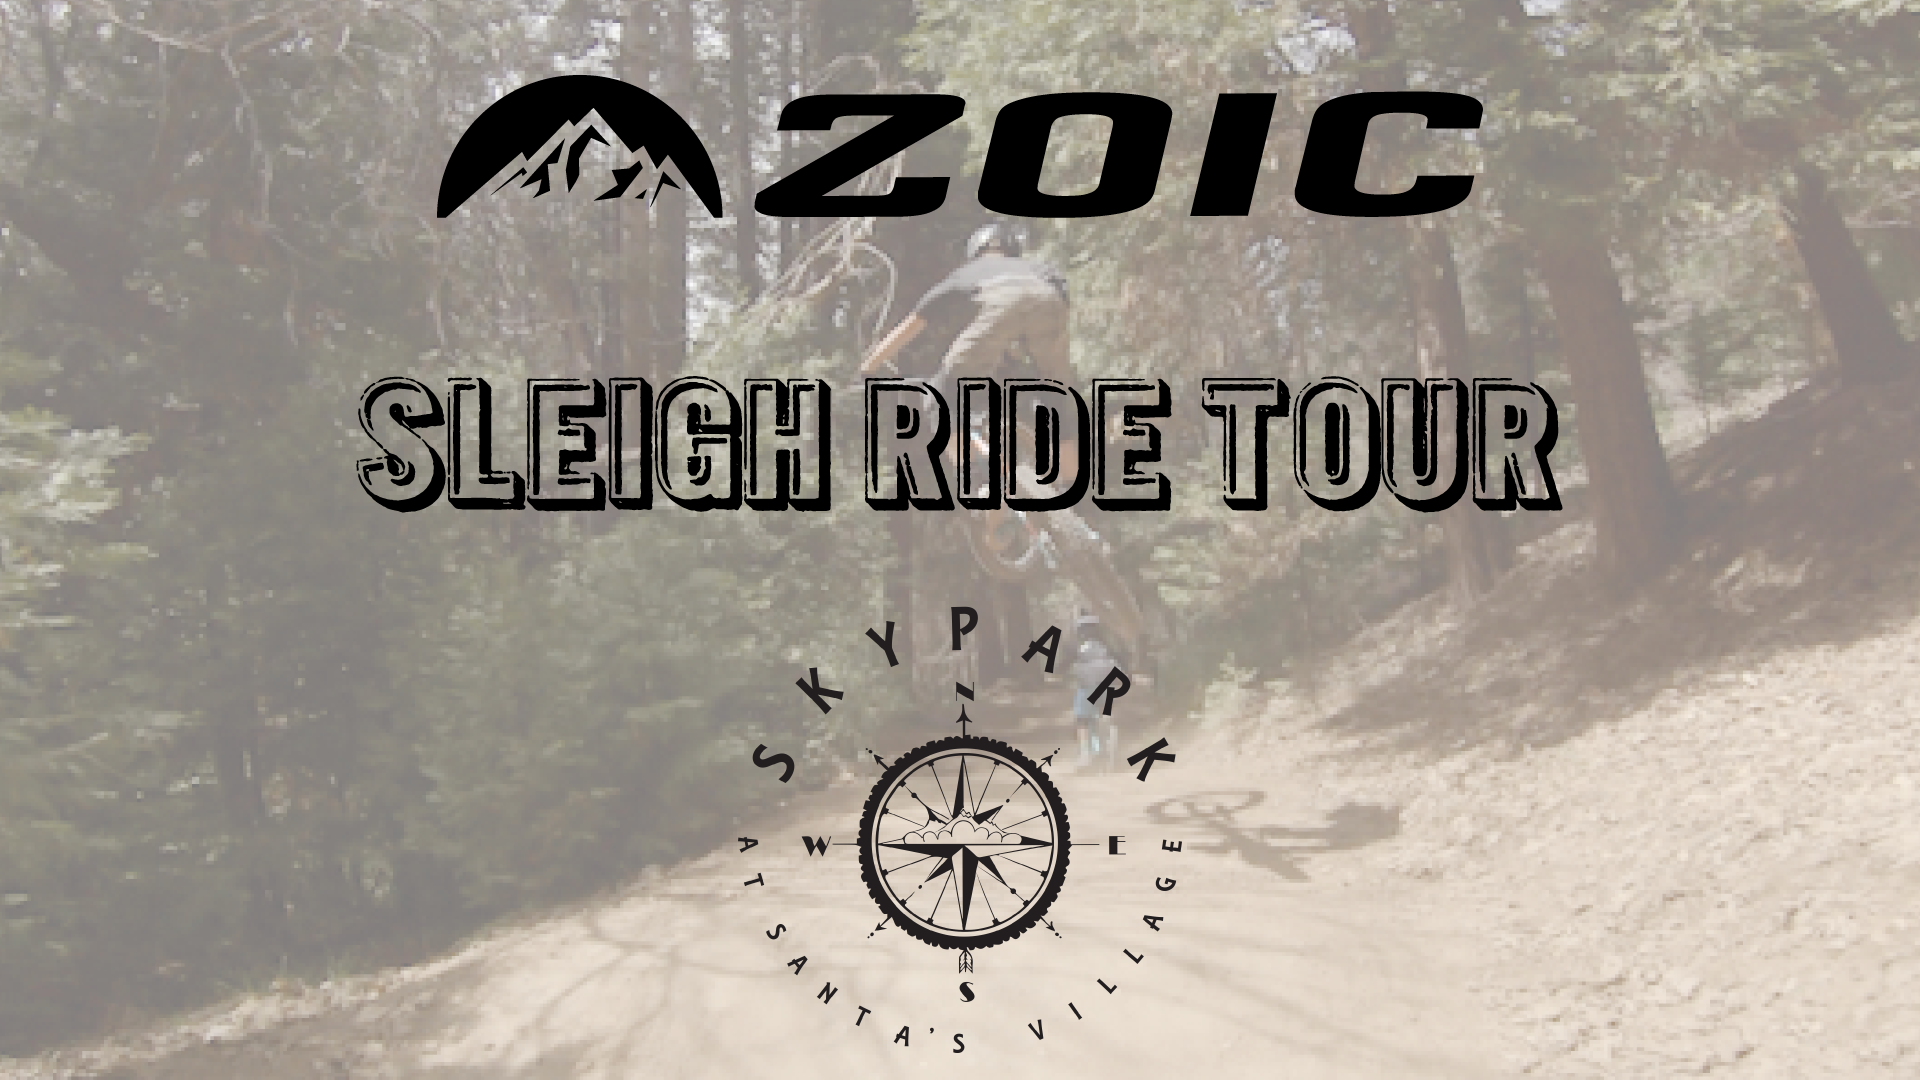 ZOIC Tour of Sleigh Ride Trail at Sky Park Santa's Village